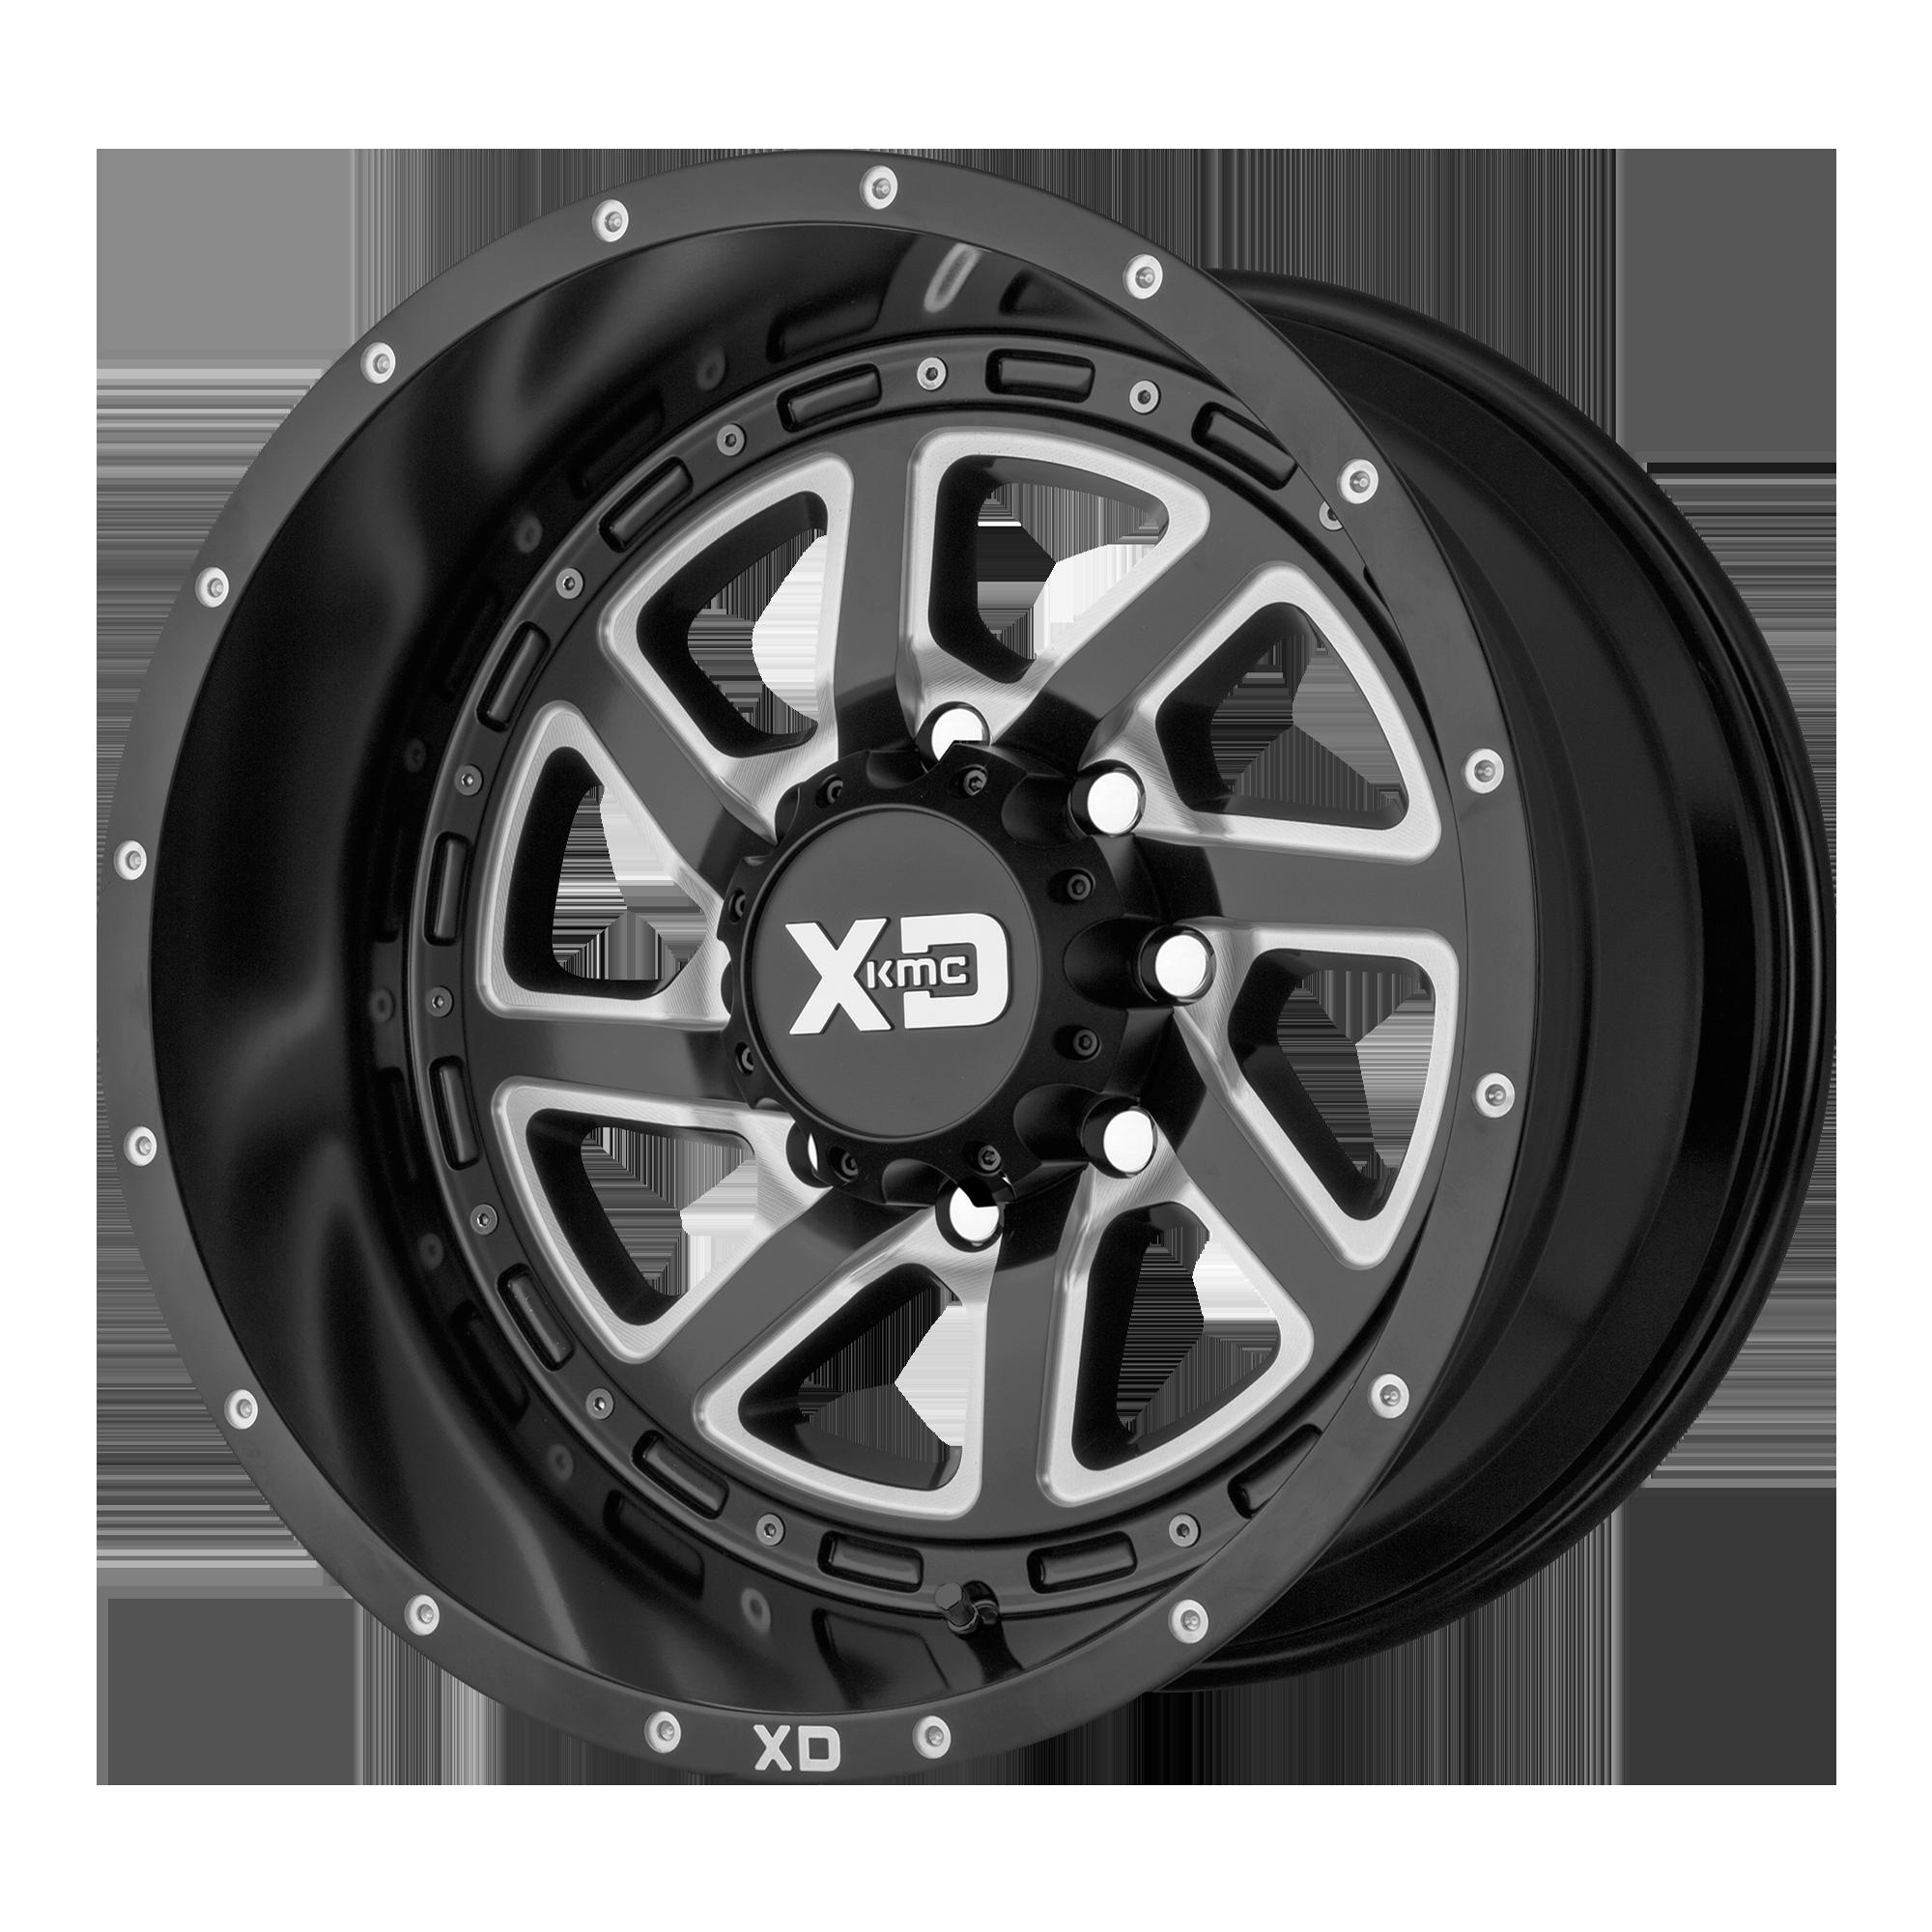 XD SERIES XD833 RECOIL hliníkové disky 9x17 6x139,7 ET-12 Satin Black Milled With Reversible Ring